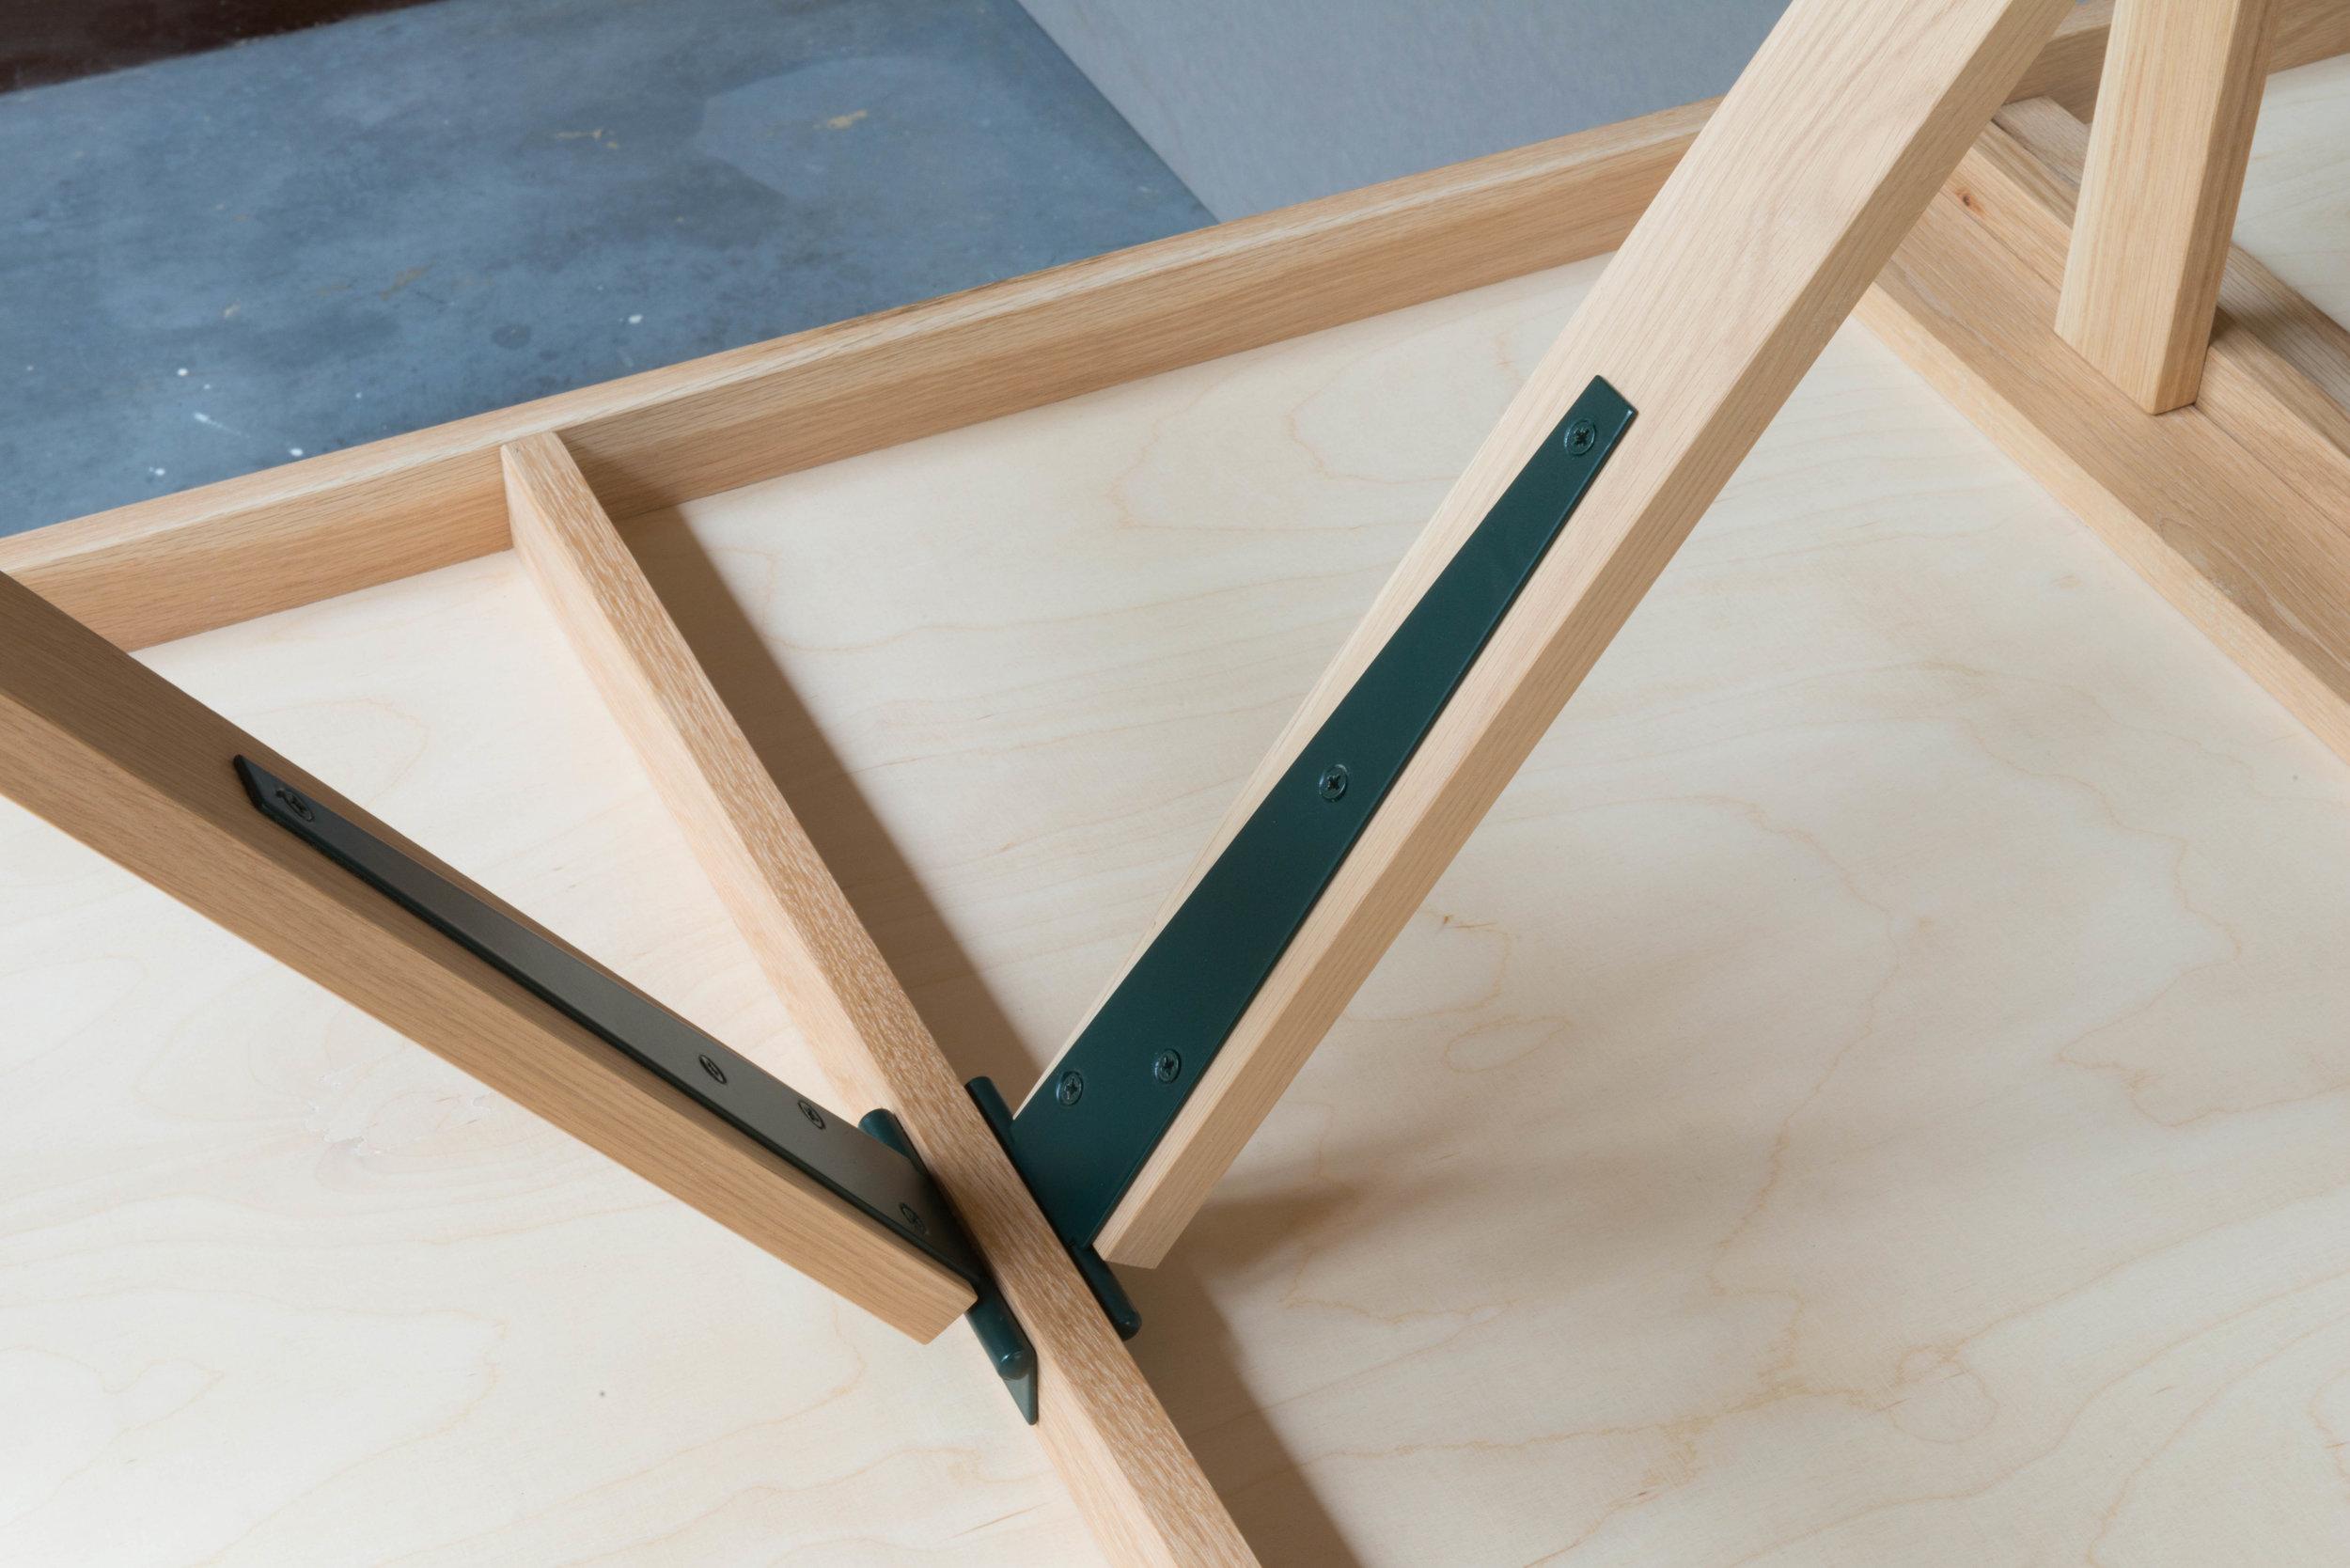 EF folding tables-5748.jpg